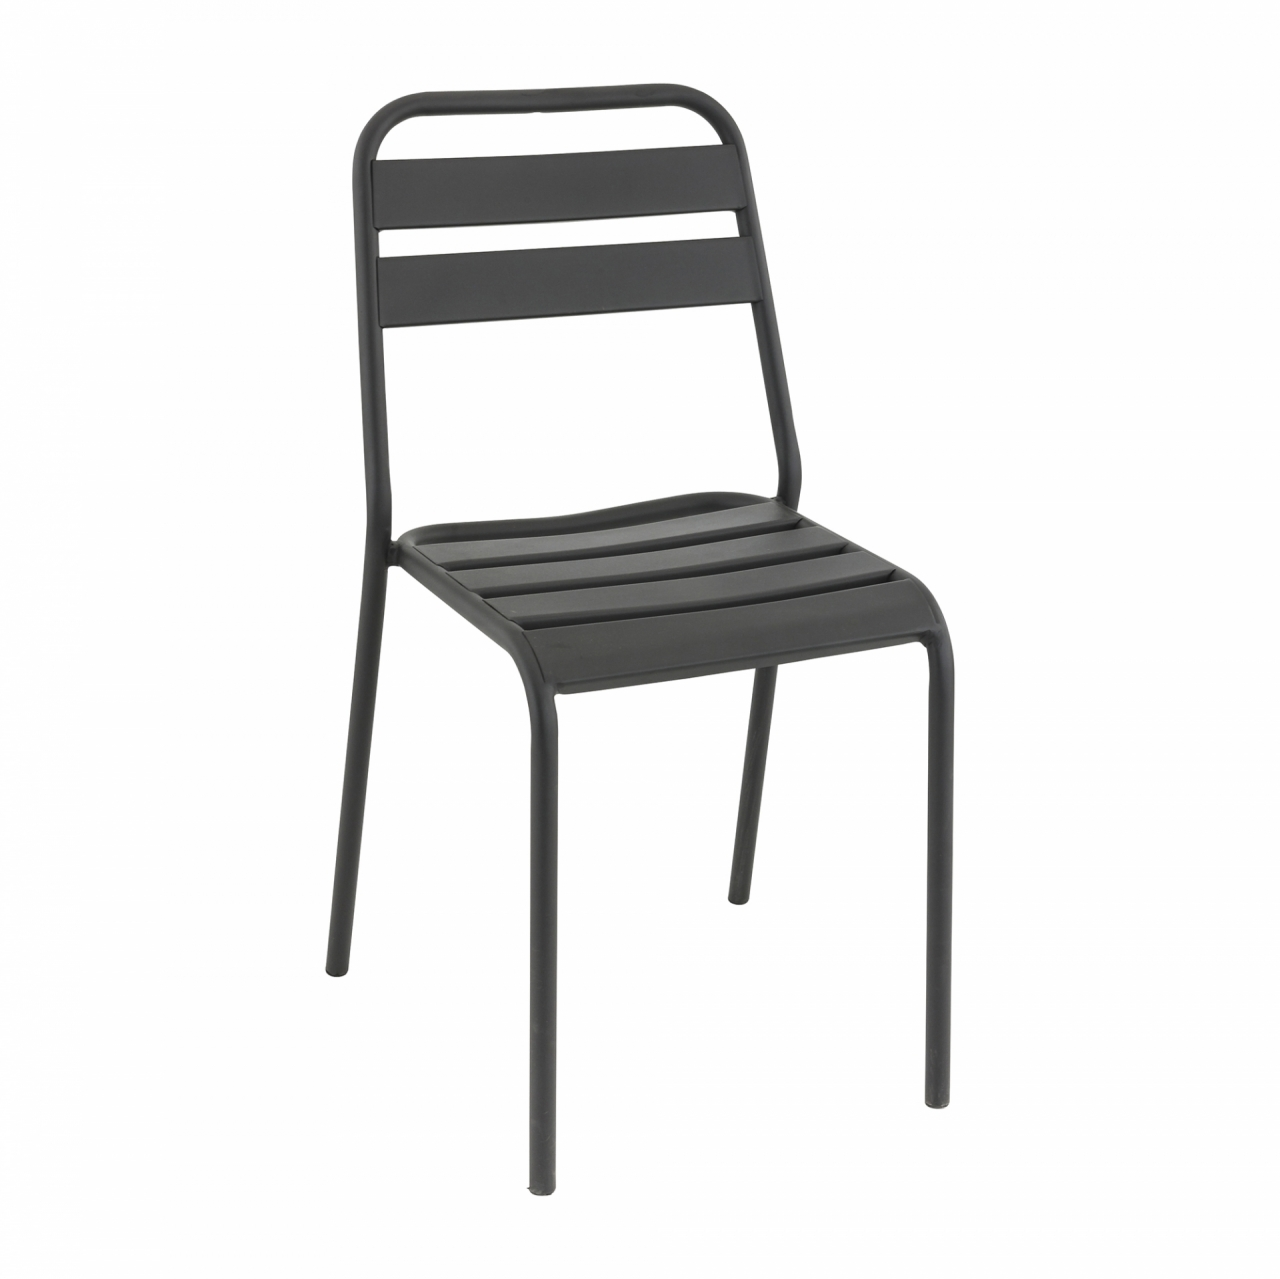 mobilier coulomb chaise de terrasse m tal bastille mobilier terrasse de bar restaurant chr. Black Bedroom Furniture Sets. Home Design Ideas